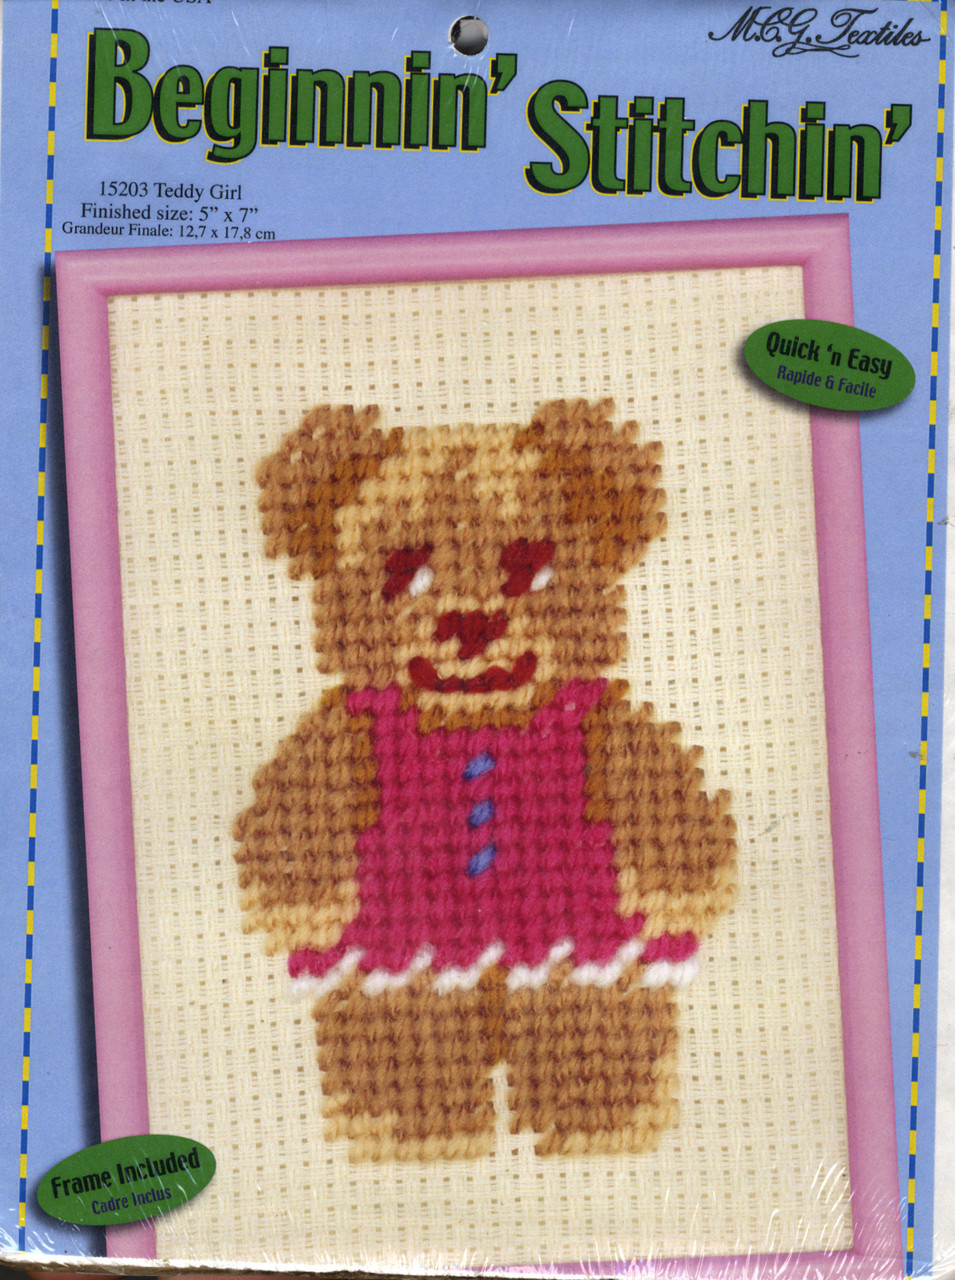 Candamar Beginnin' Stitchin' - Teddy Girl